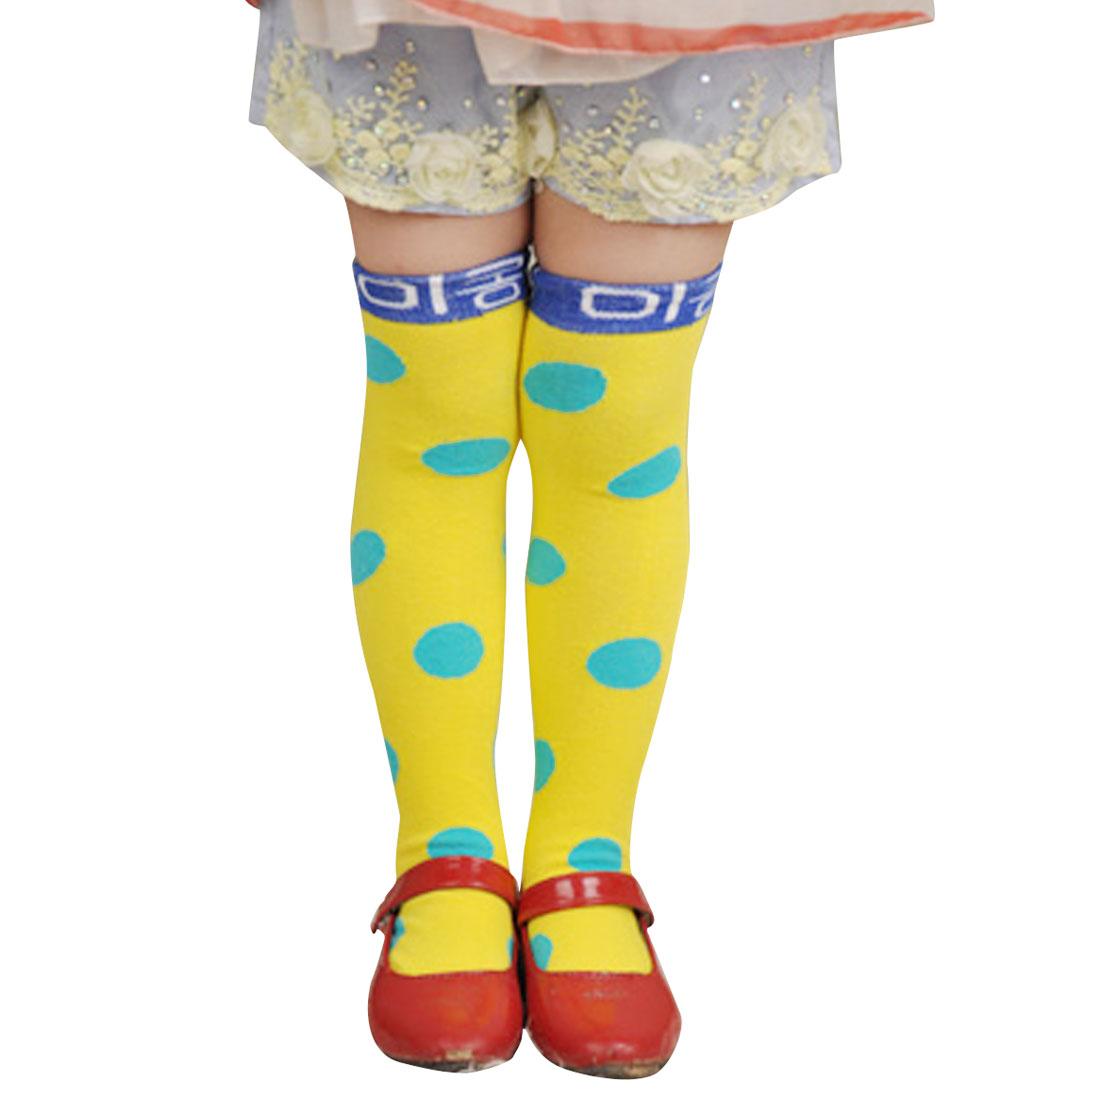 Polka Dots Pattern Footwear Princess Sockings Yellow Blue for 2-8Y Child Girls